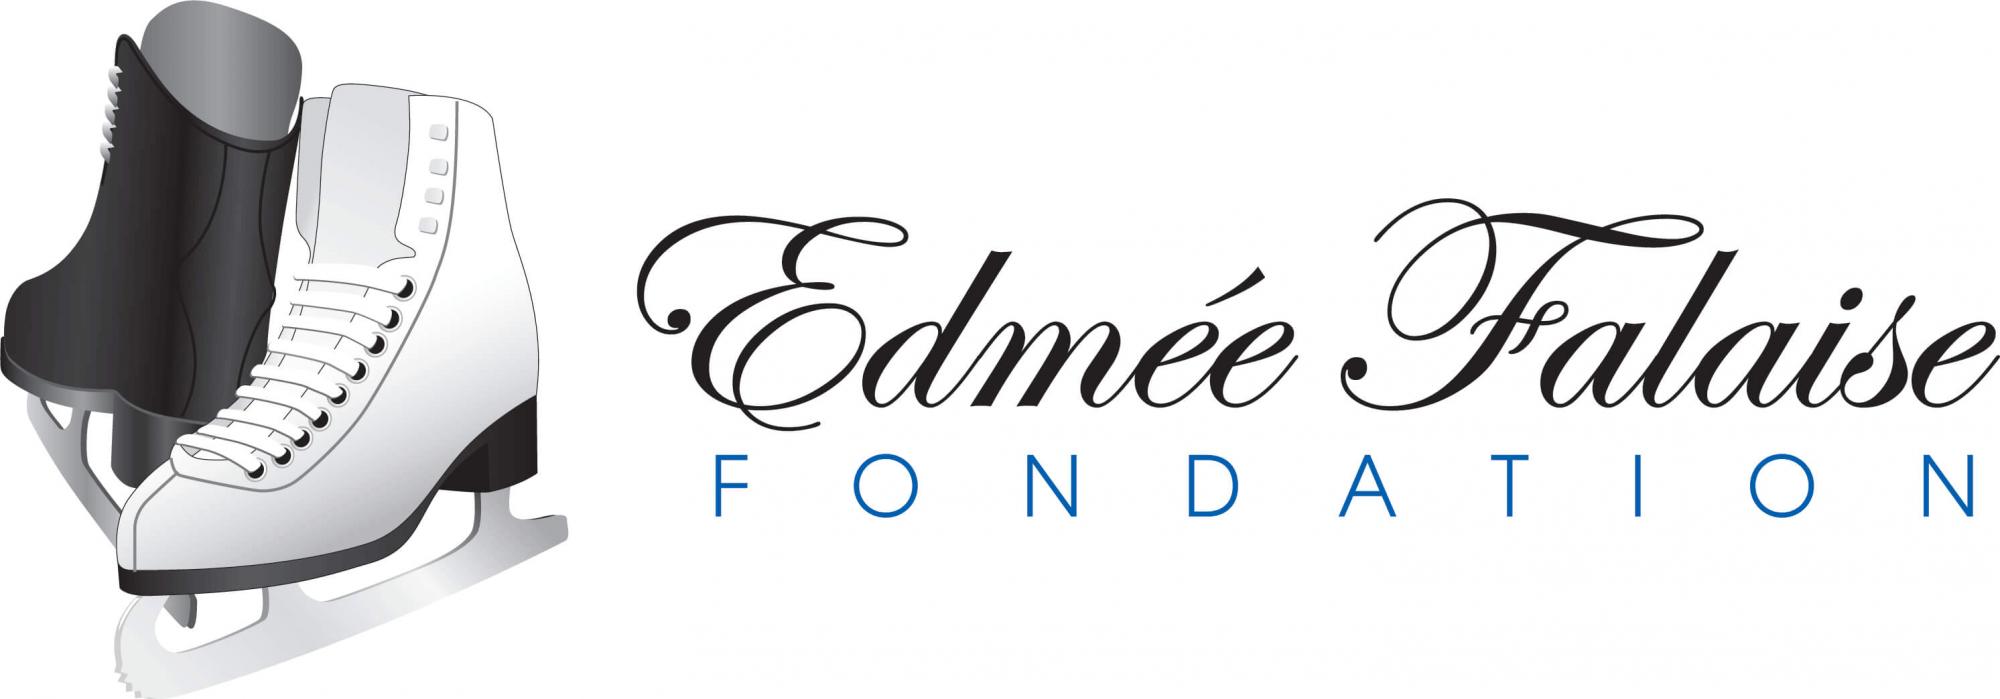 logo Edmée Falaise fondation